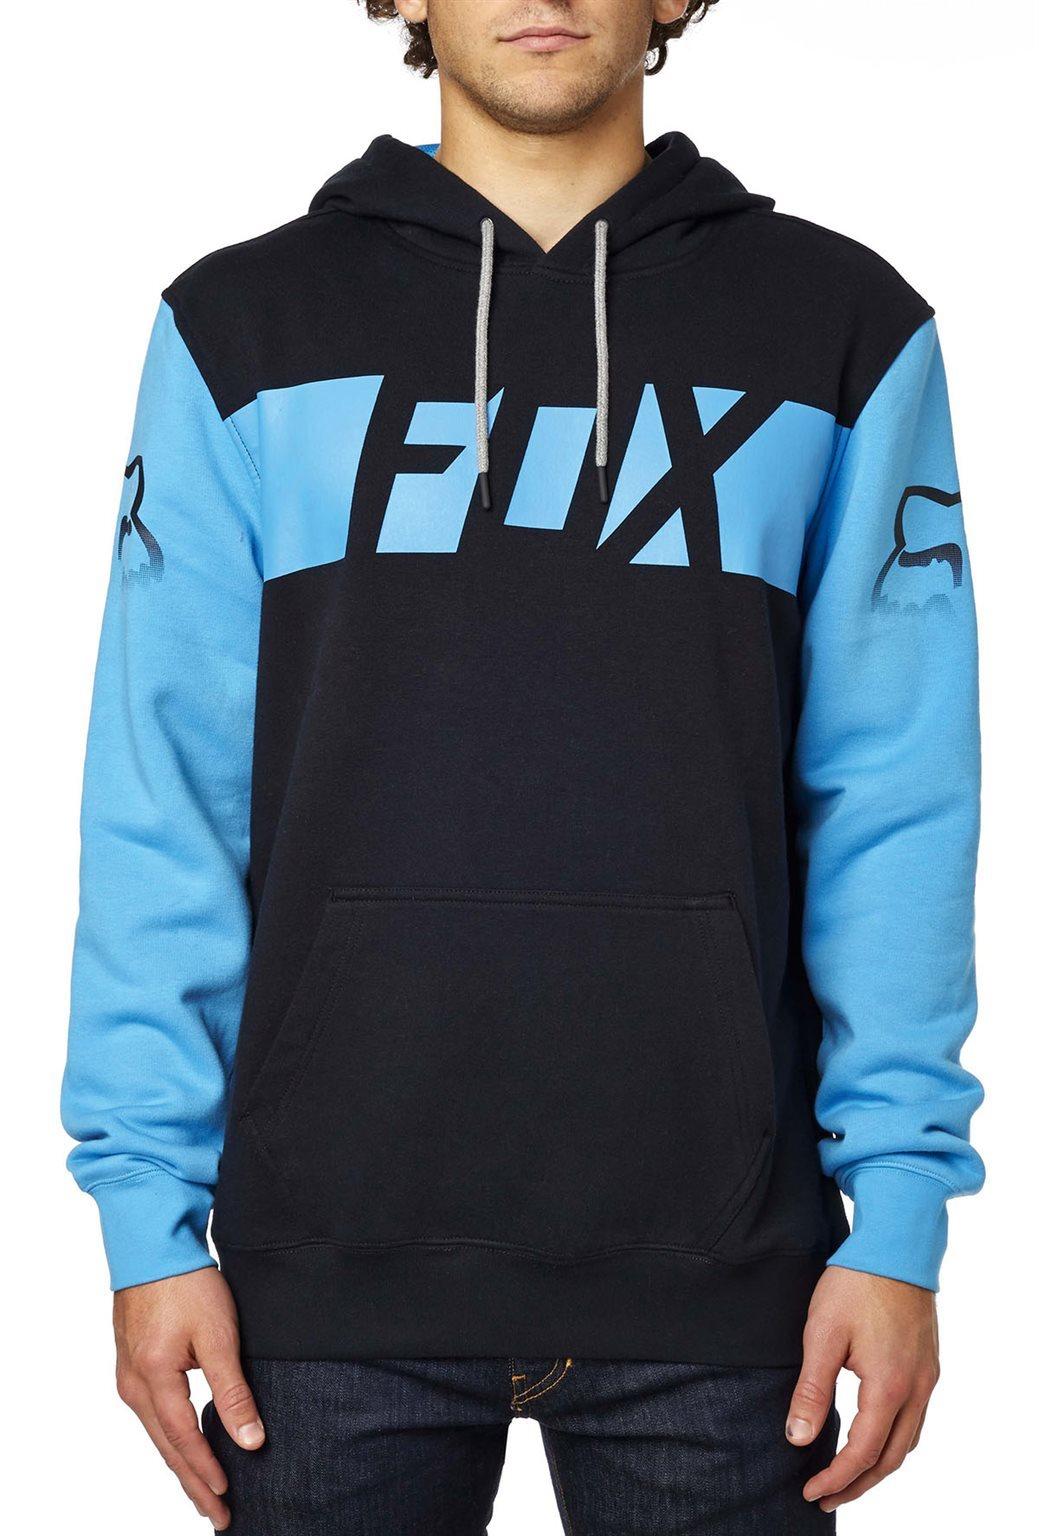 Fox pulóver Libra